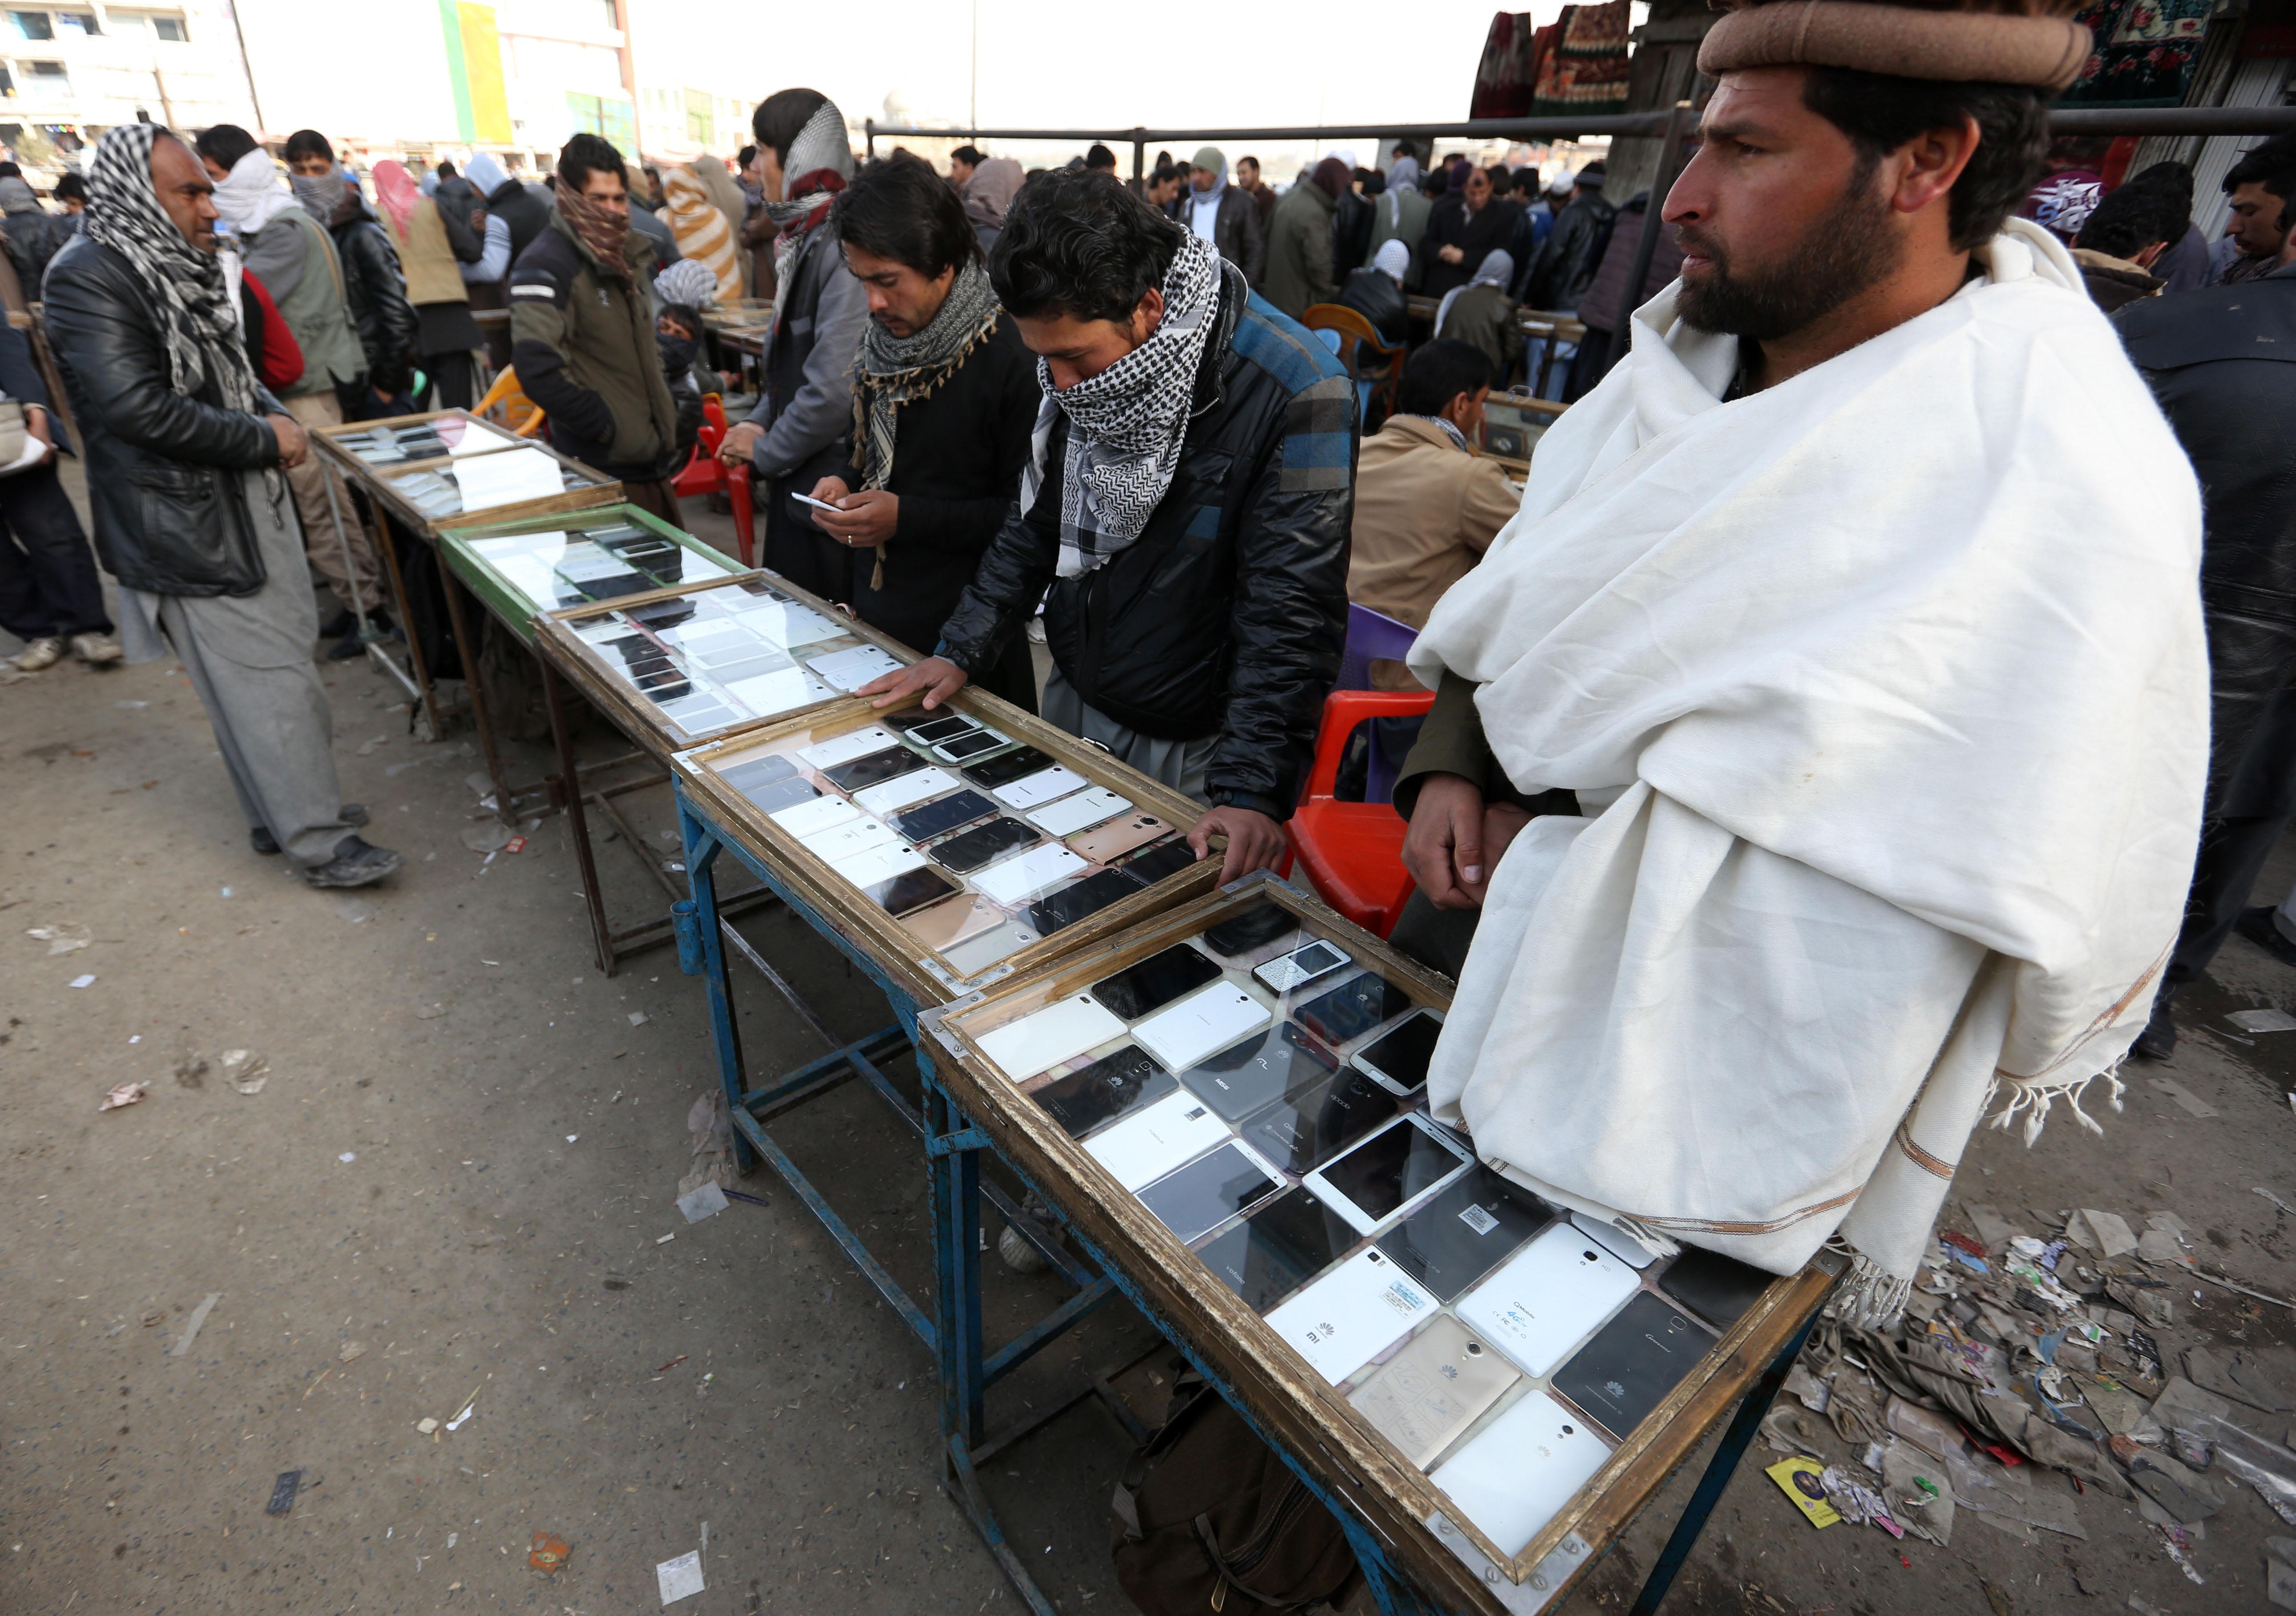 Afghan vendors selling smartphones wait for customers at a market in Kabul, Afghanistan. Image: AP Photo/Rahmat Gul